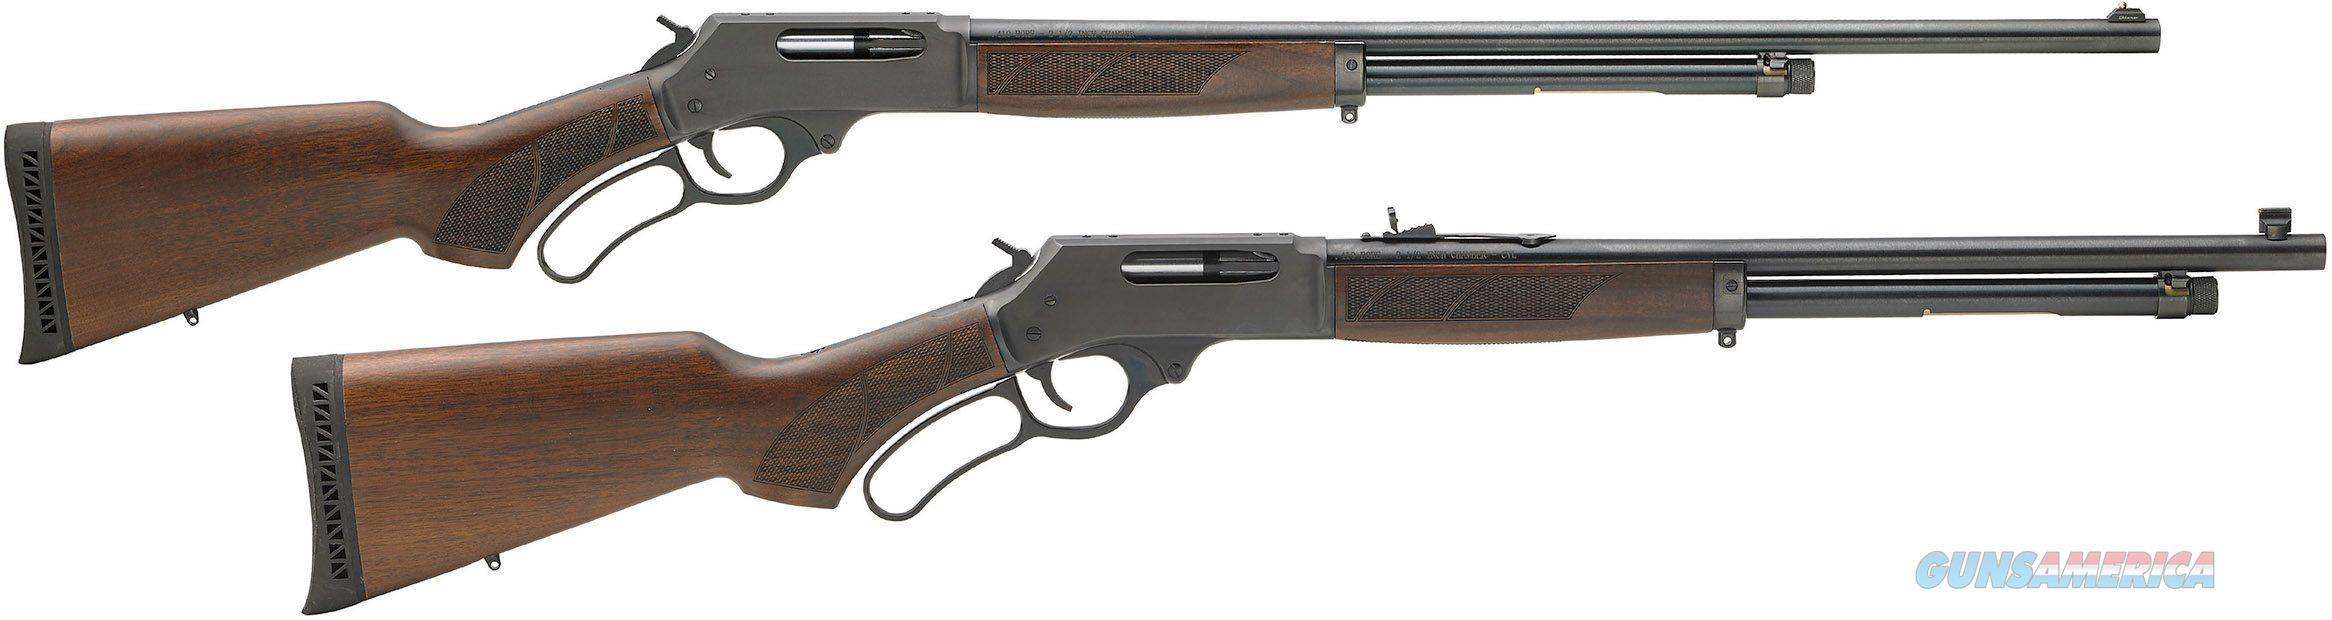 Henry Lever Action Shotgun 410g 20in  Guns > Shotguns > H Misc Shotguns